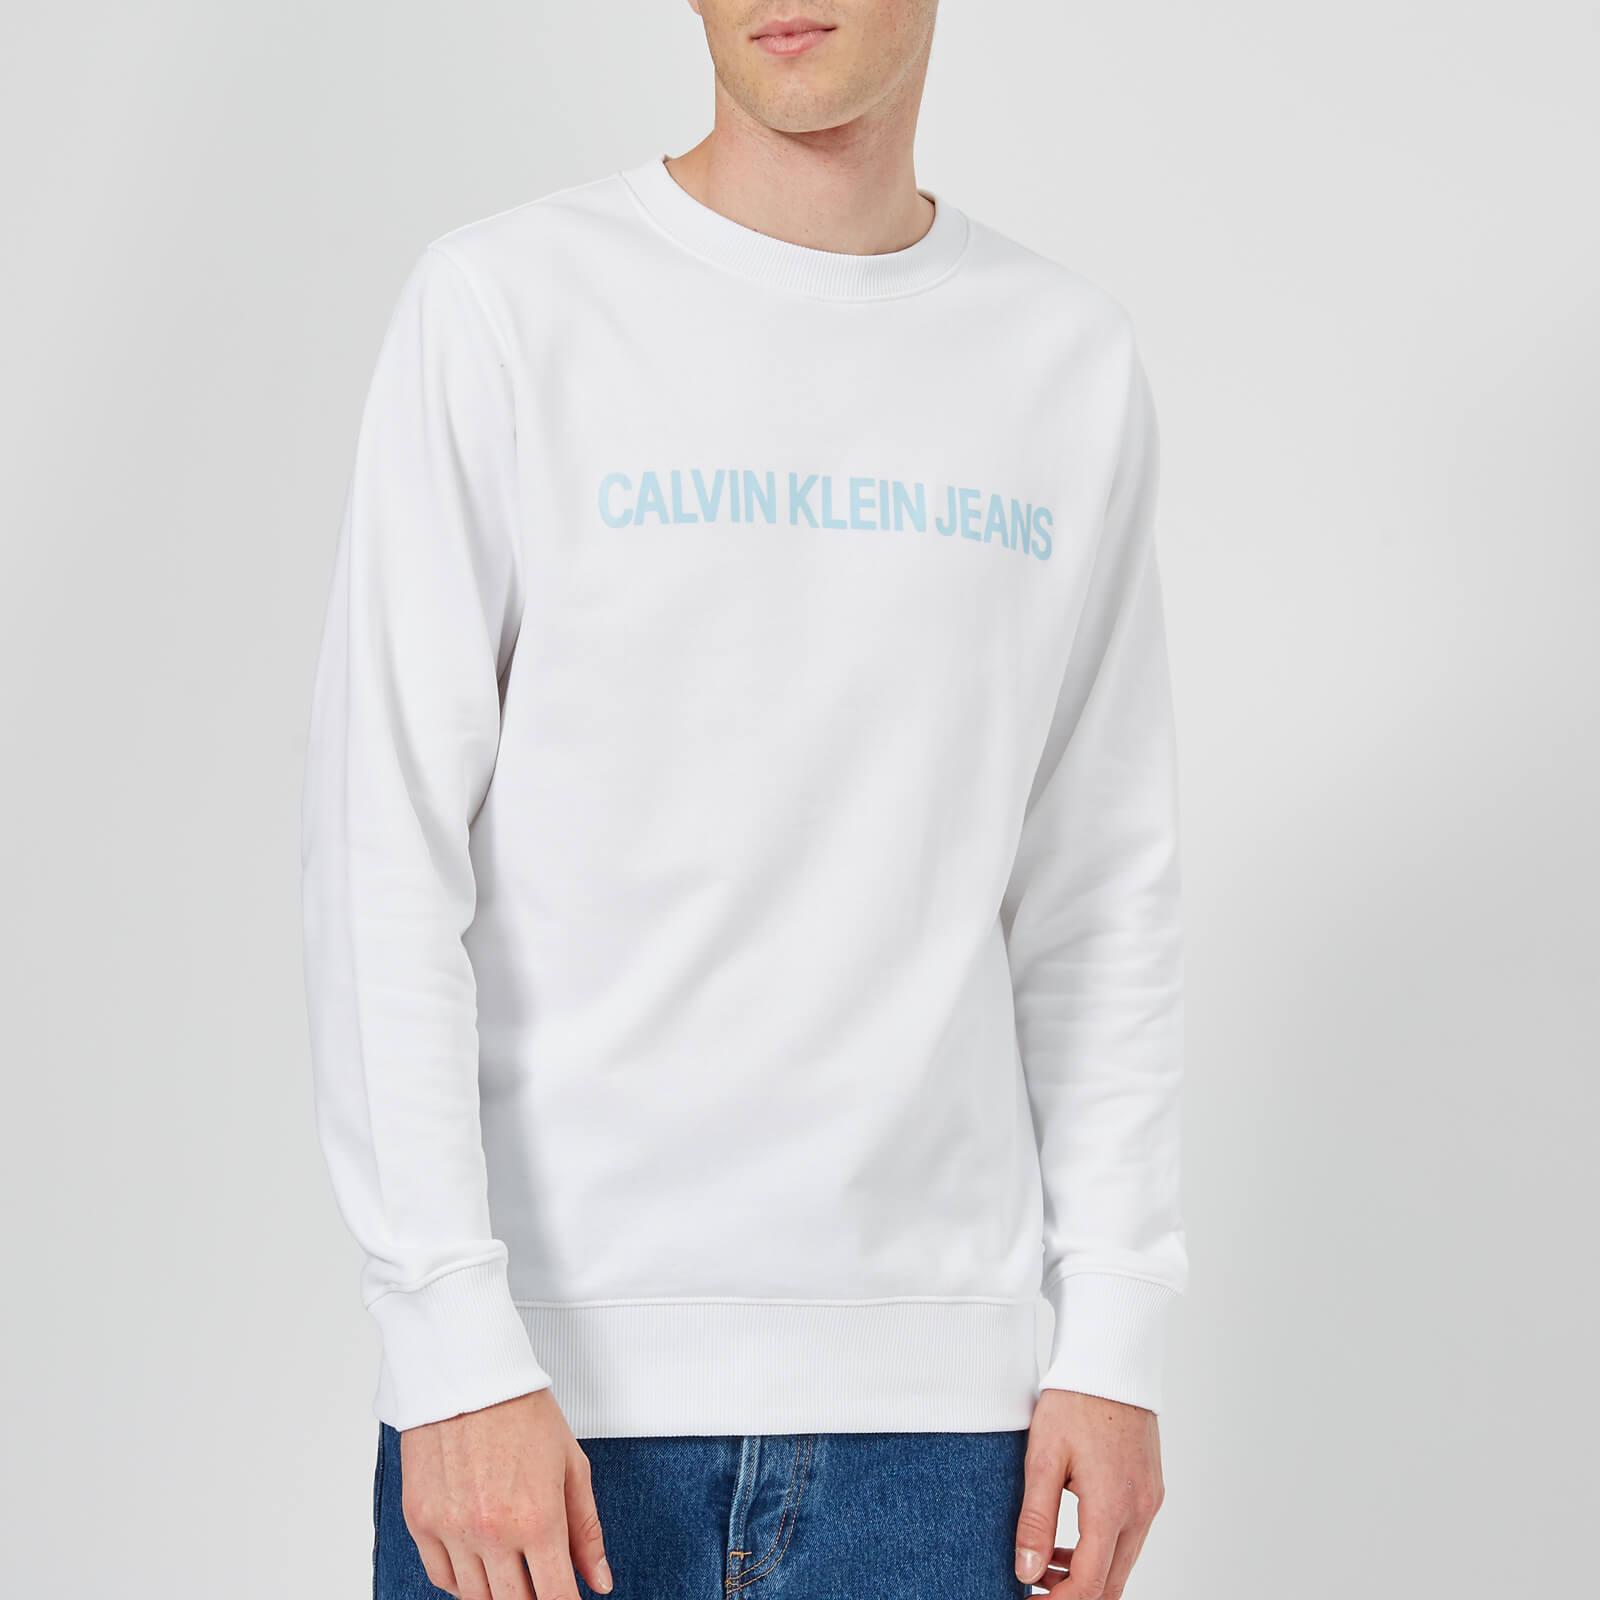 4035eb8d0b6c Calvin Klein Jeans Men s Institutional Logo Sweatshirt - Bright White Mens  Clothing